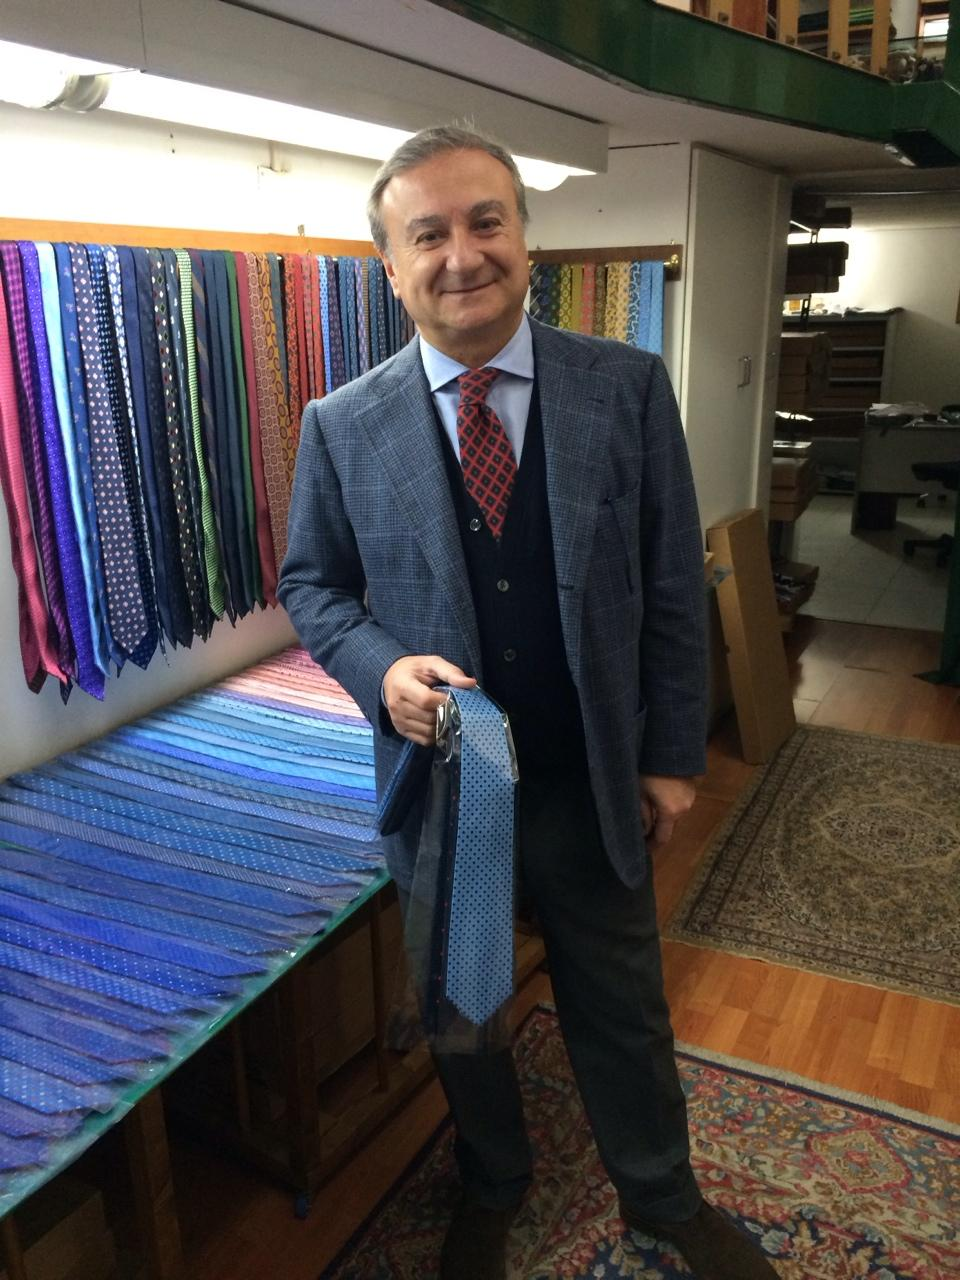 Handgjorda slipsar från E.G. Cappelli e723ada13eb9